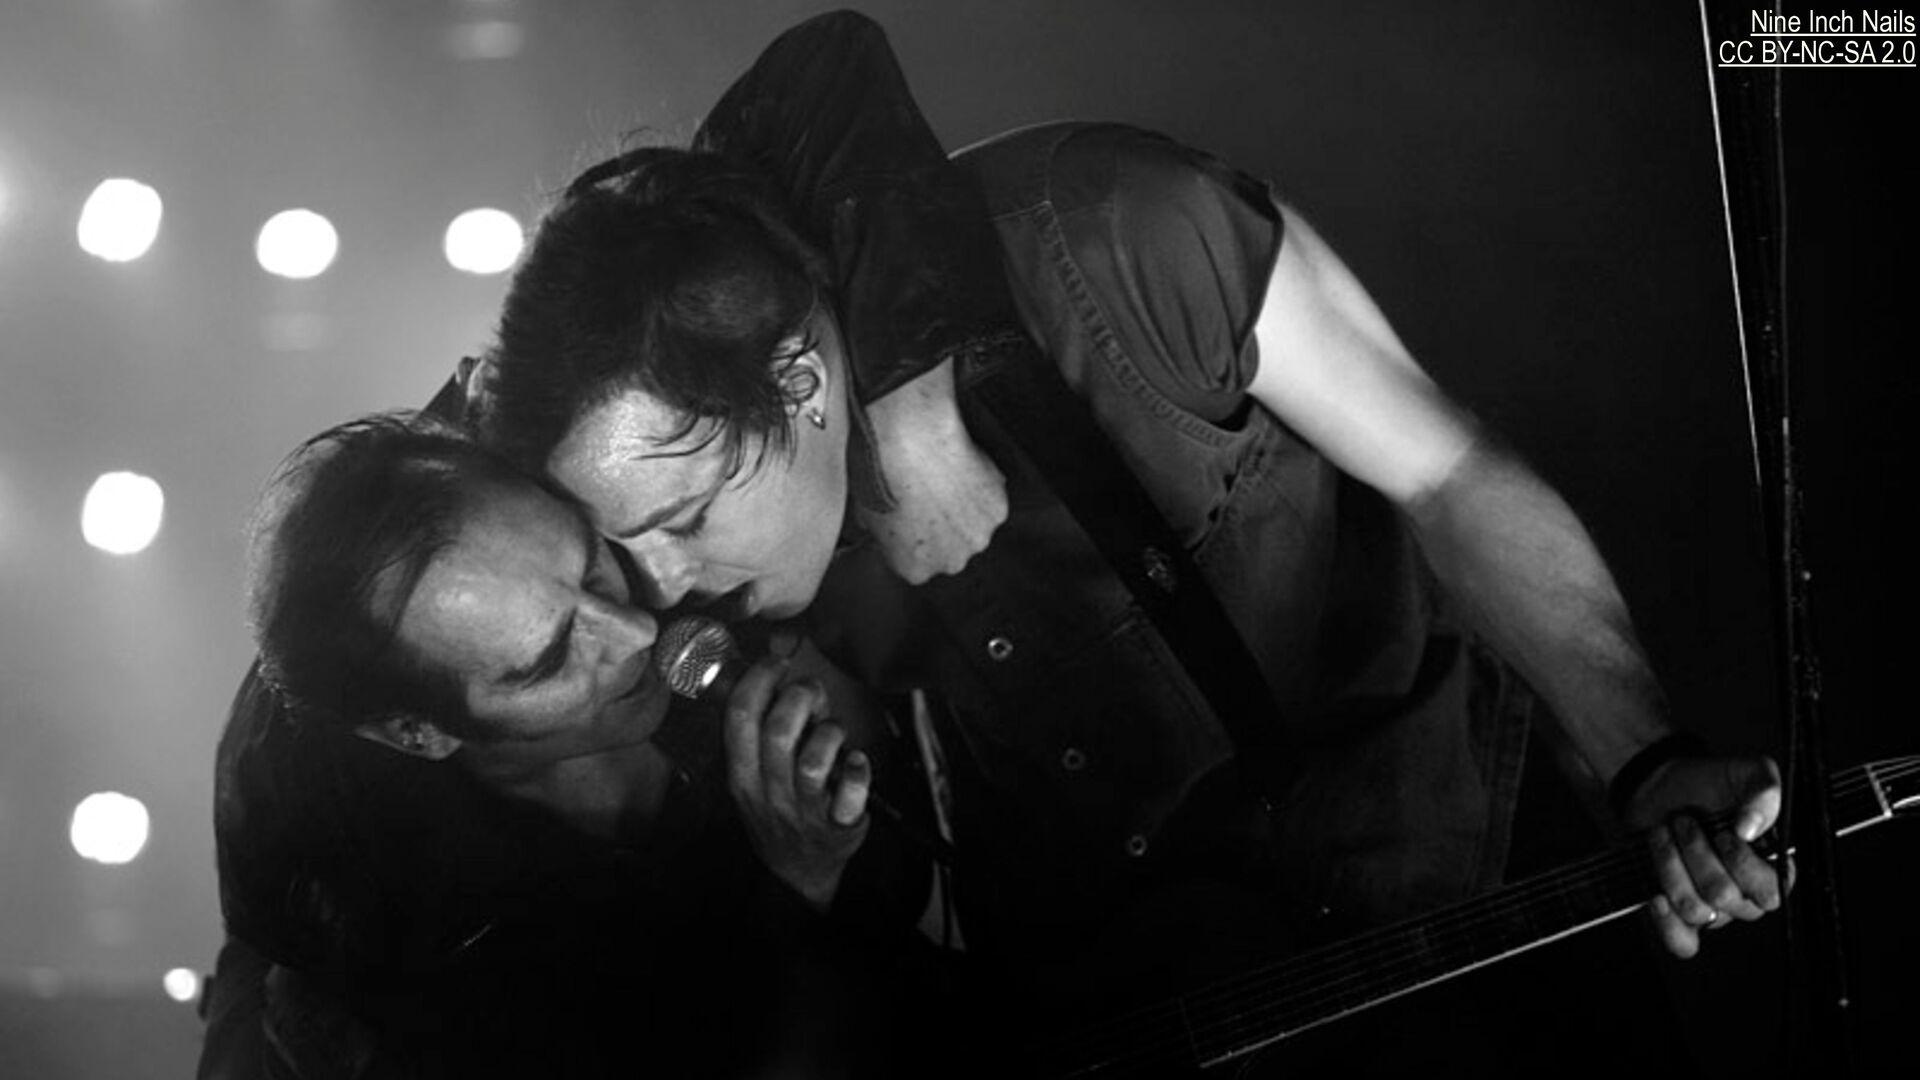 Nine Inch Nails CC BY-NC-SA 2.0 Nine Inch Nails...